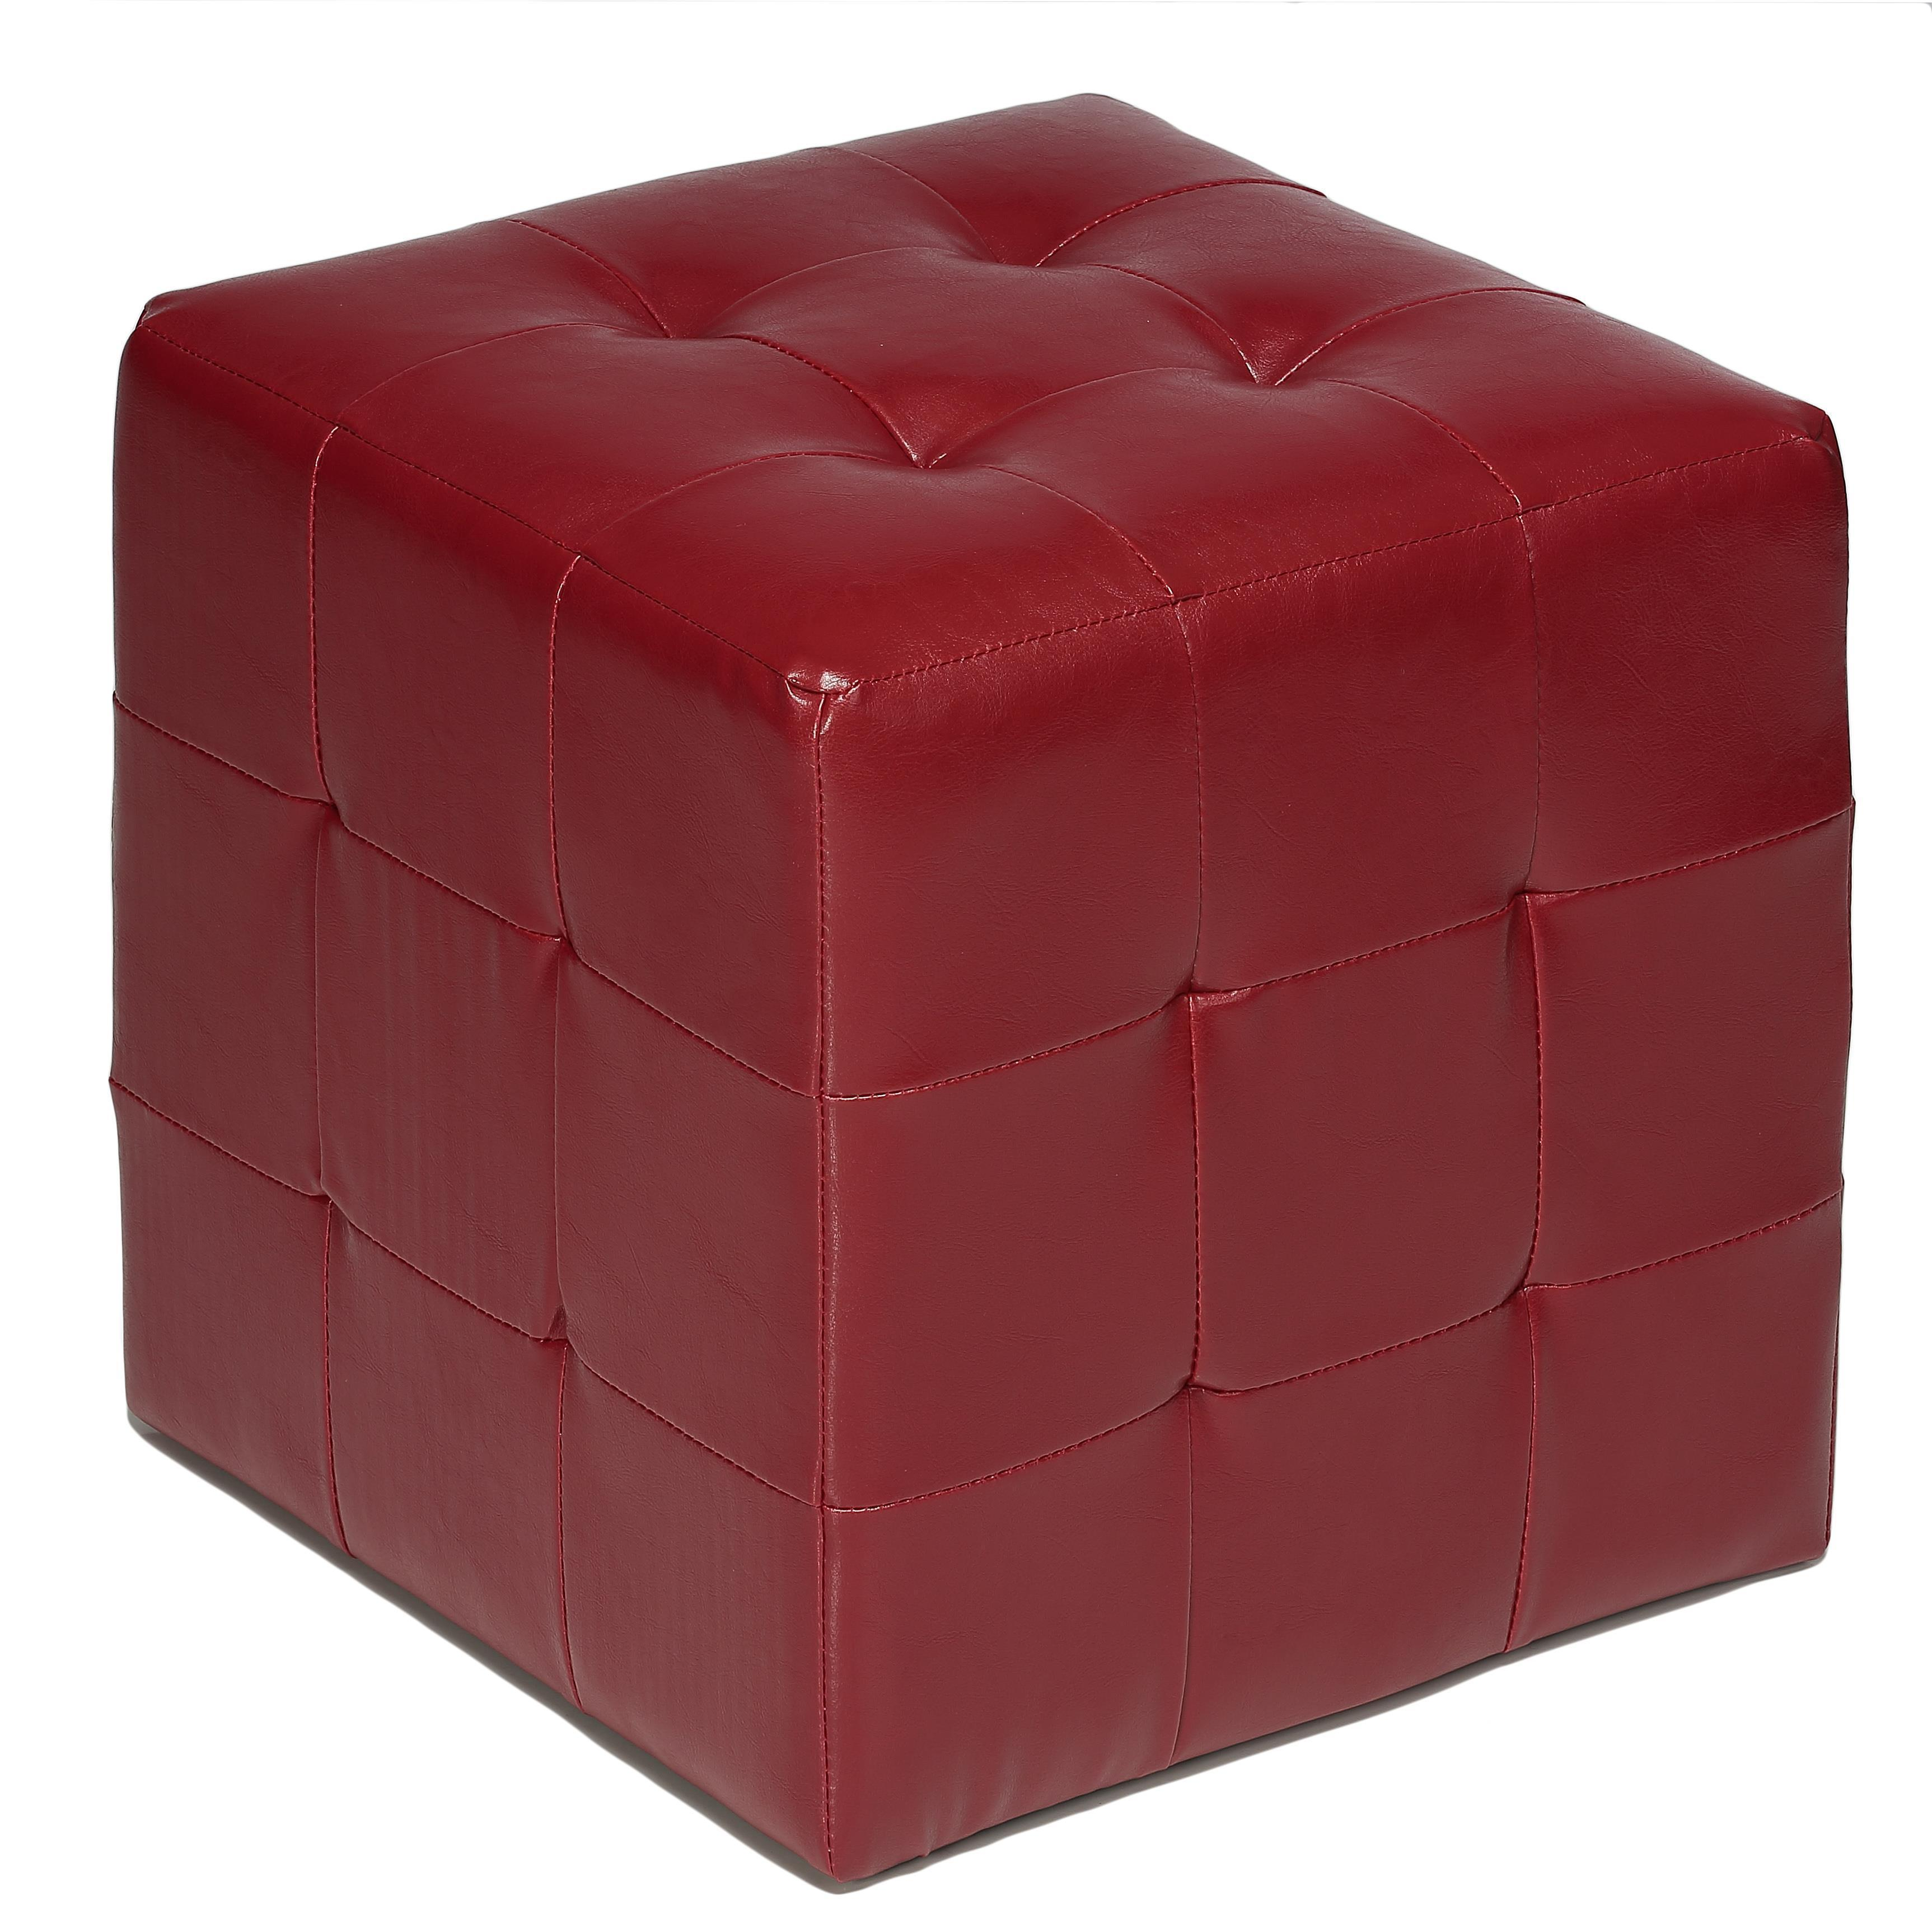 Shop Cortesi Home Braque Red Faux Leather Cube Ottoman